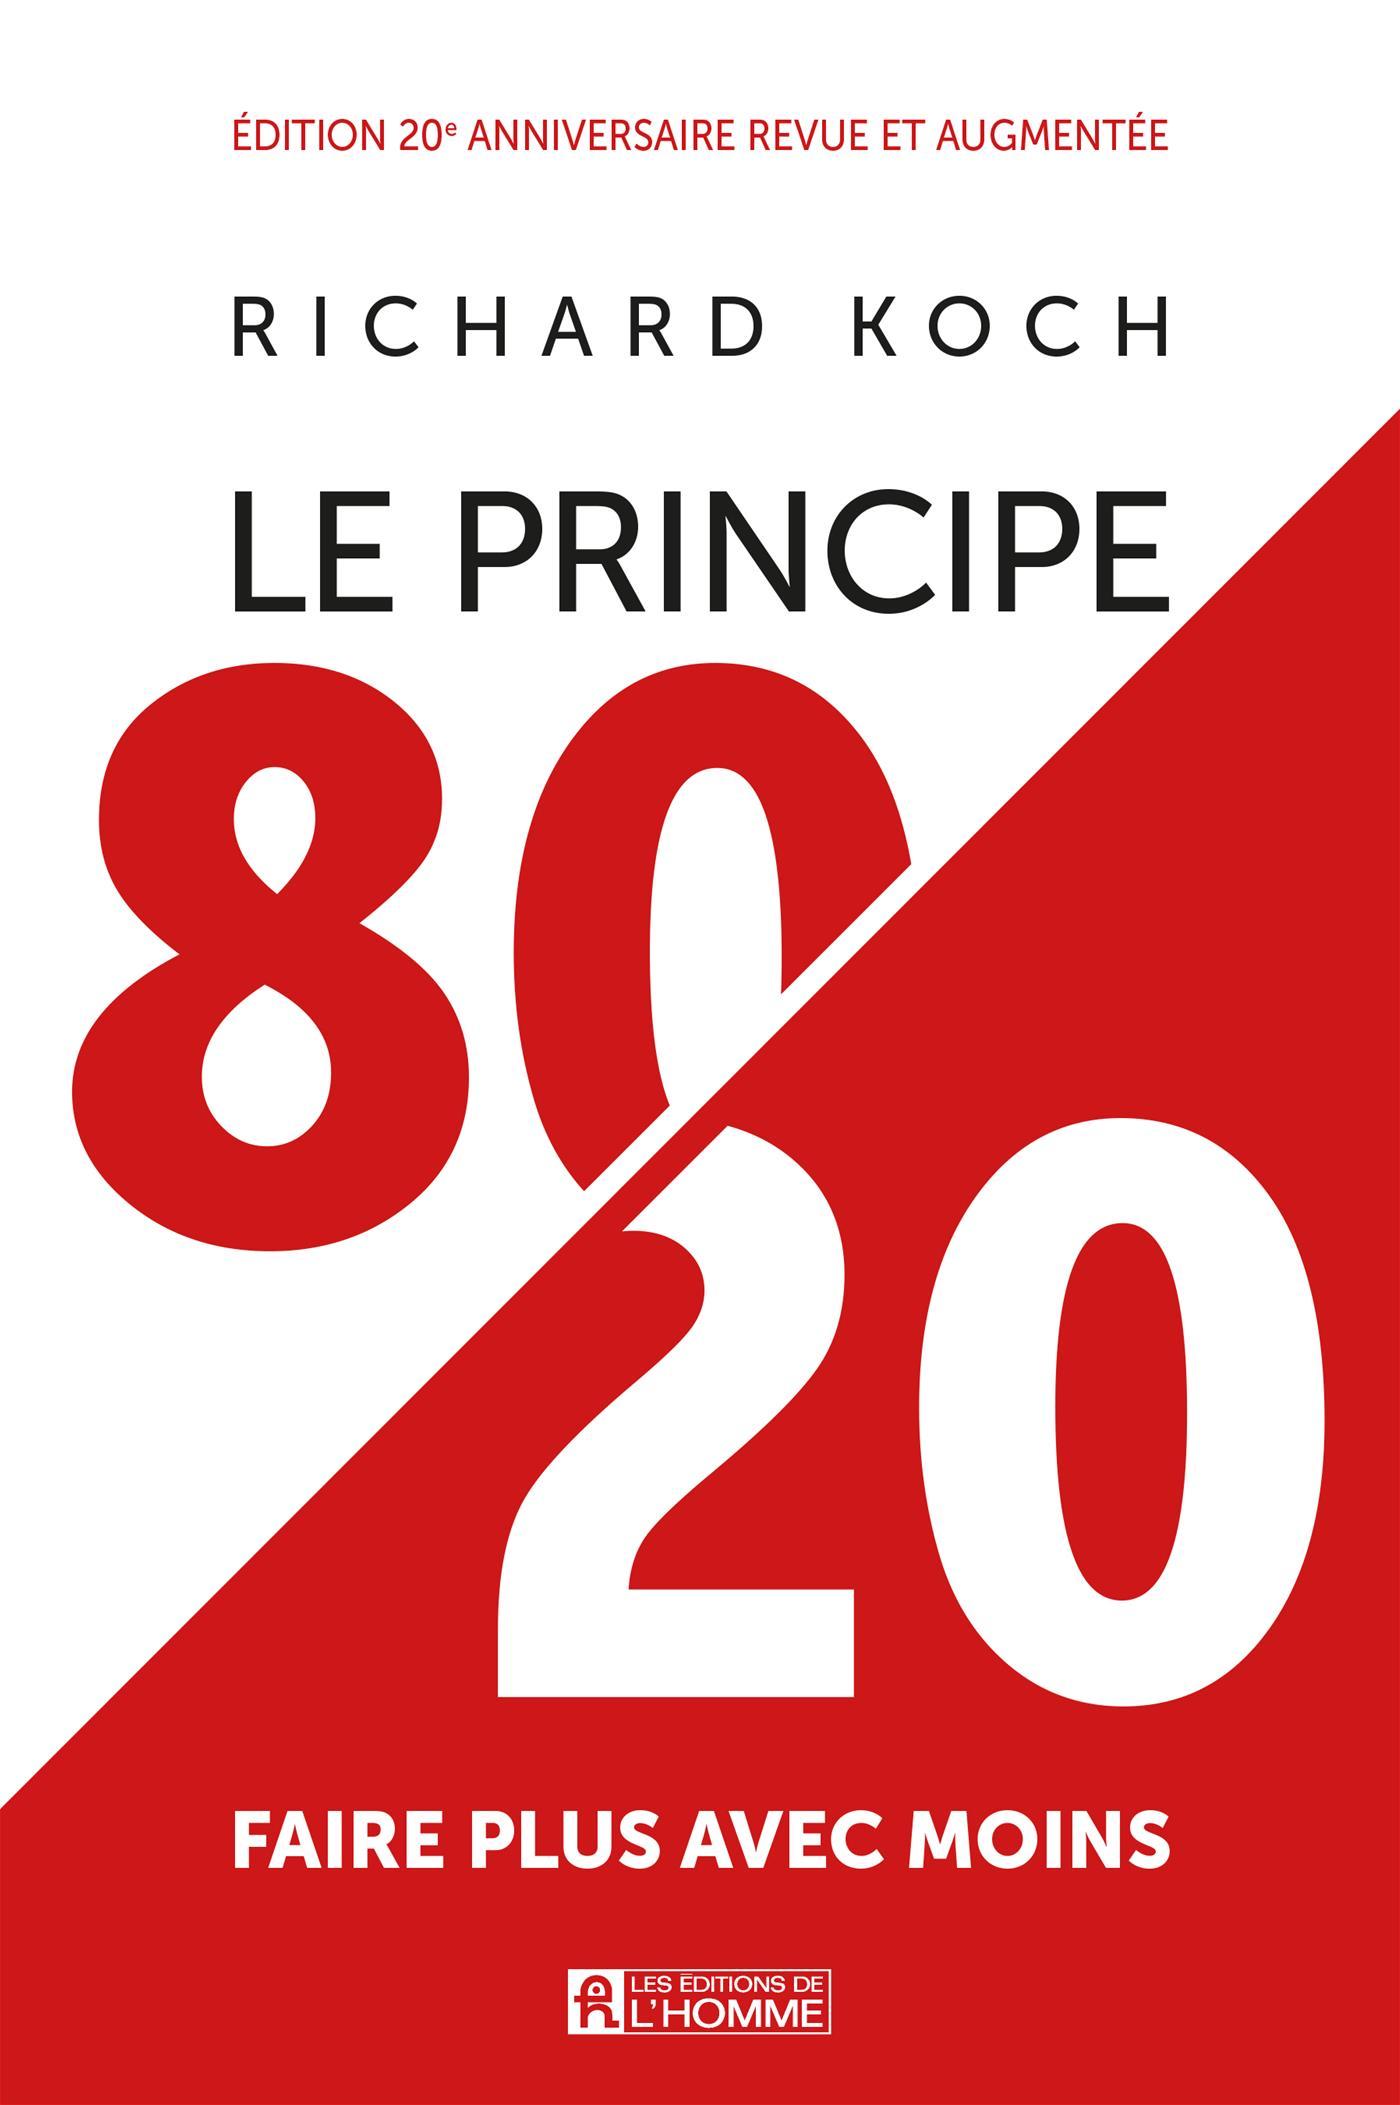 Principe 80/20